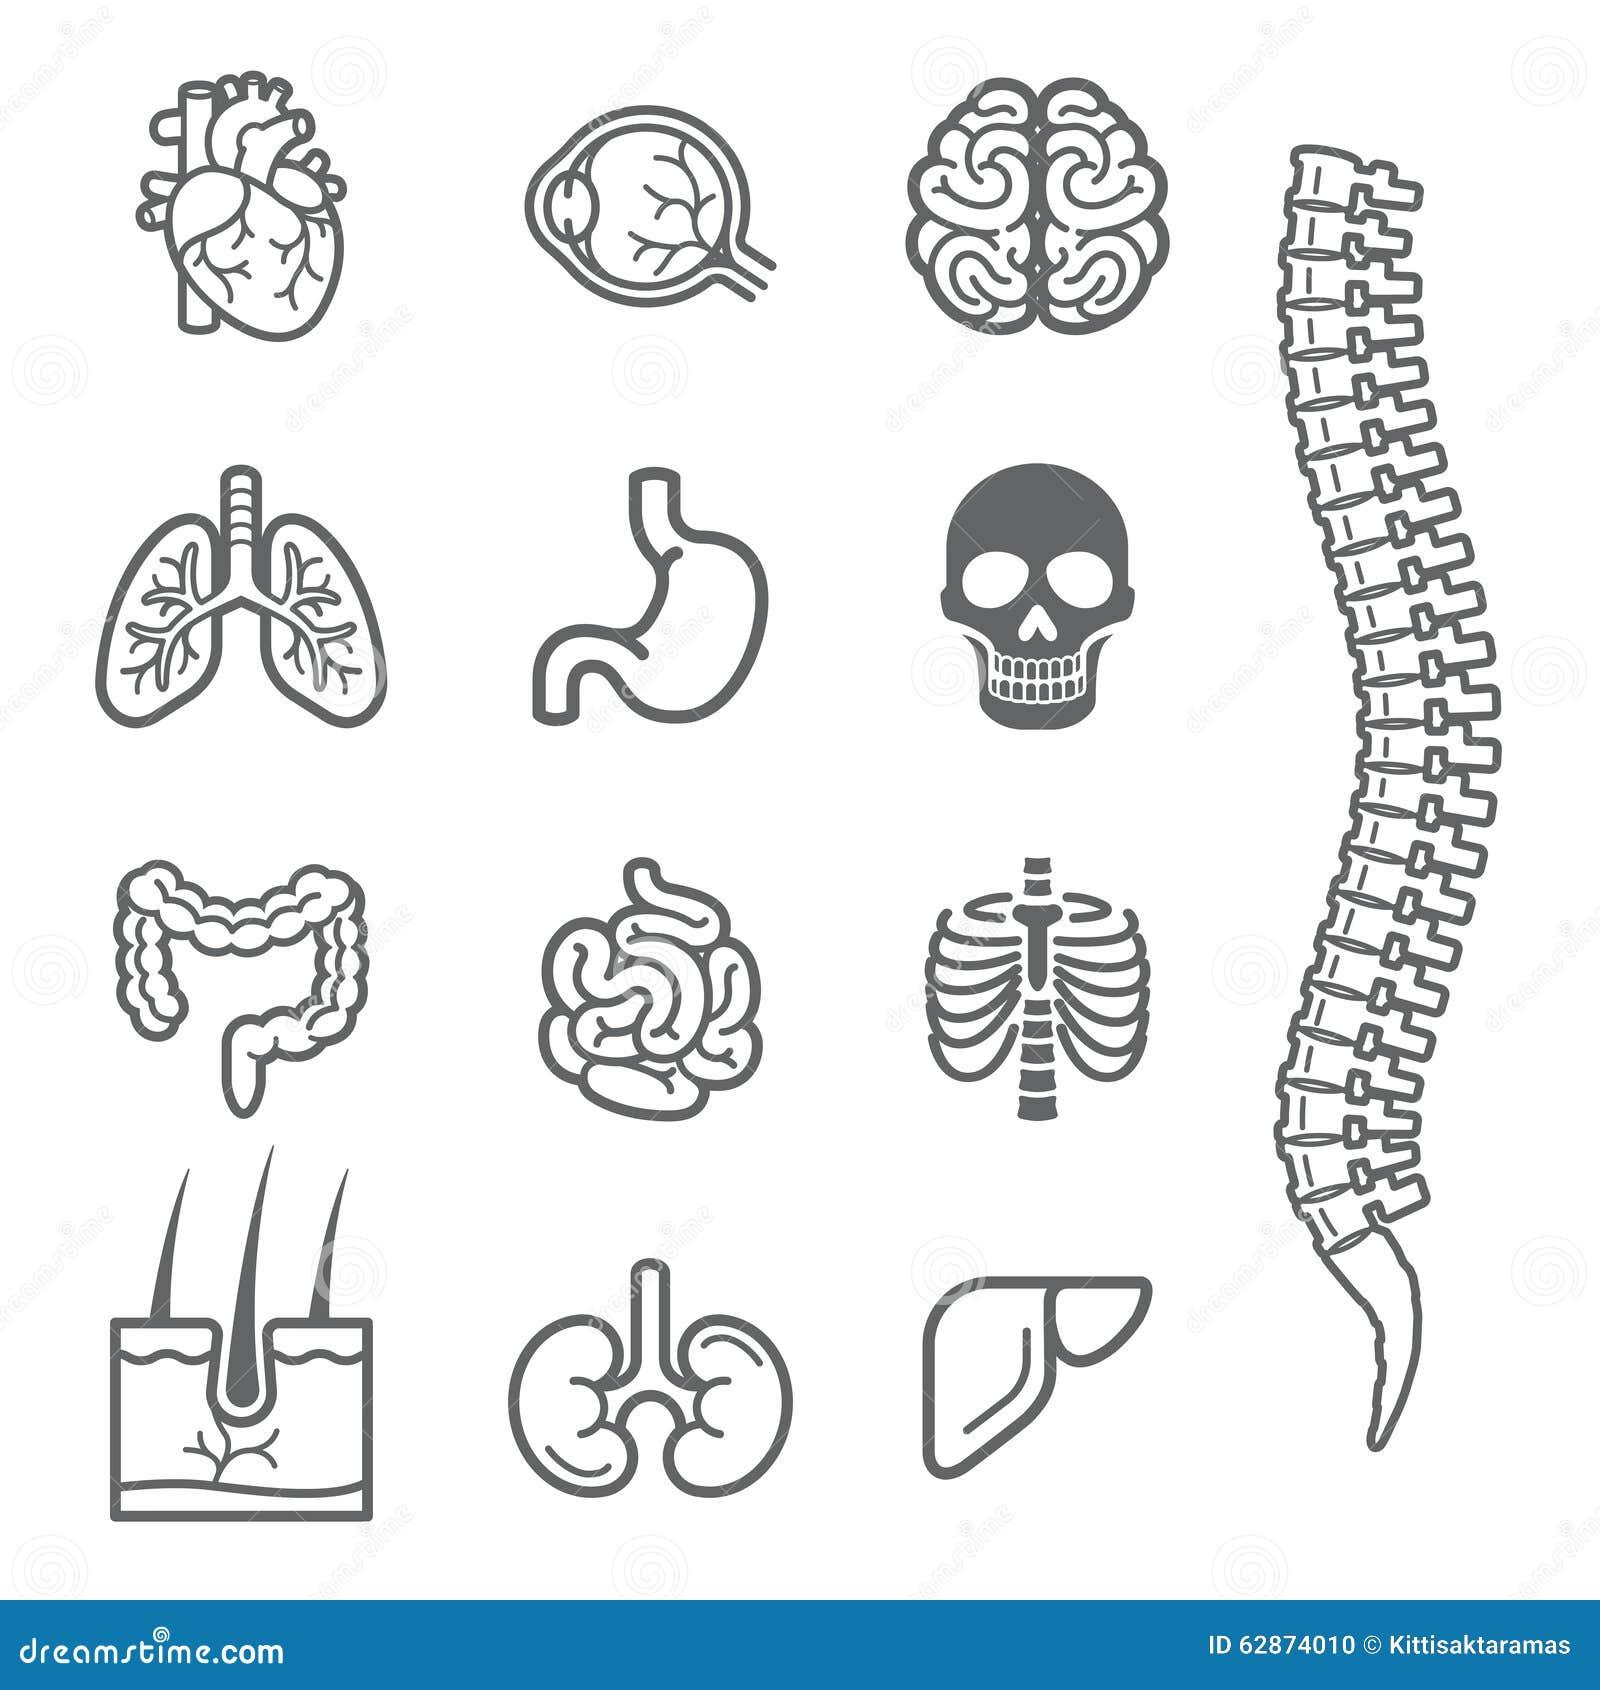 human internal organs detailed icons set  stock vector